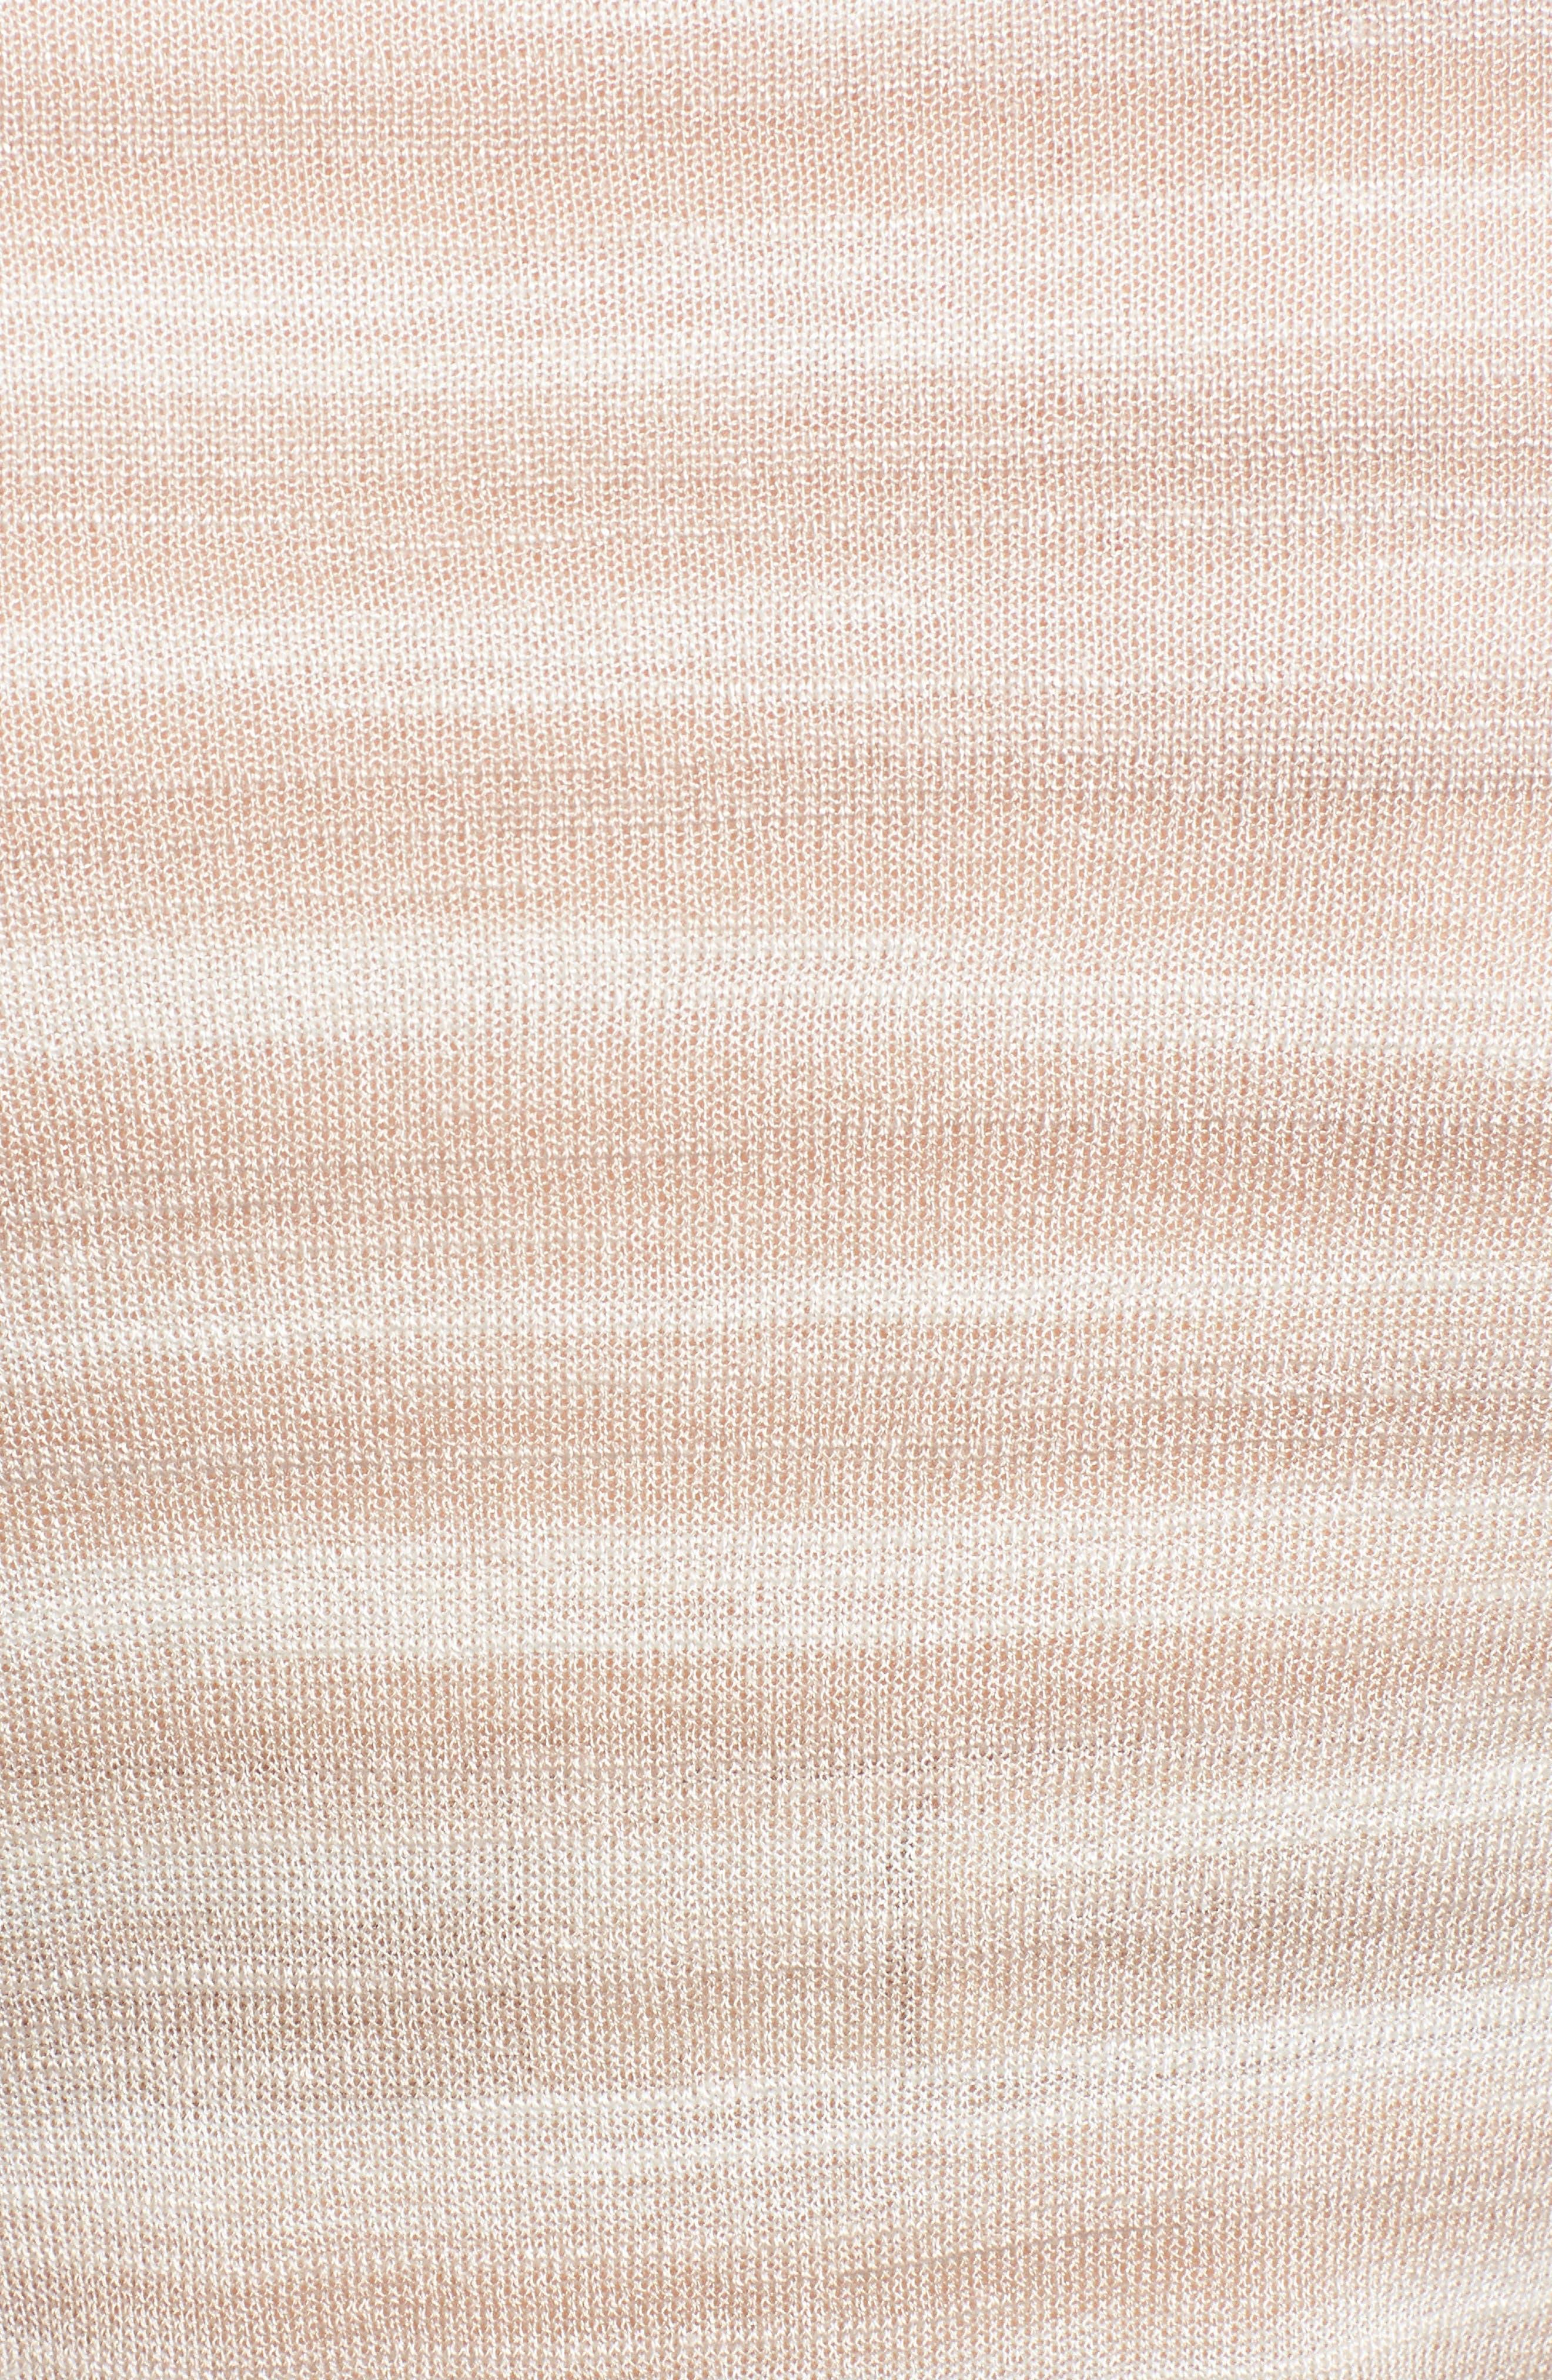 Gradient Stripe Sweater,                             Alternate thumbnail 5, color,                             250